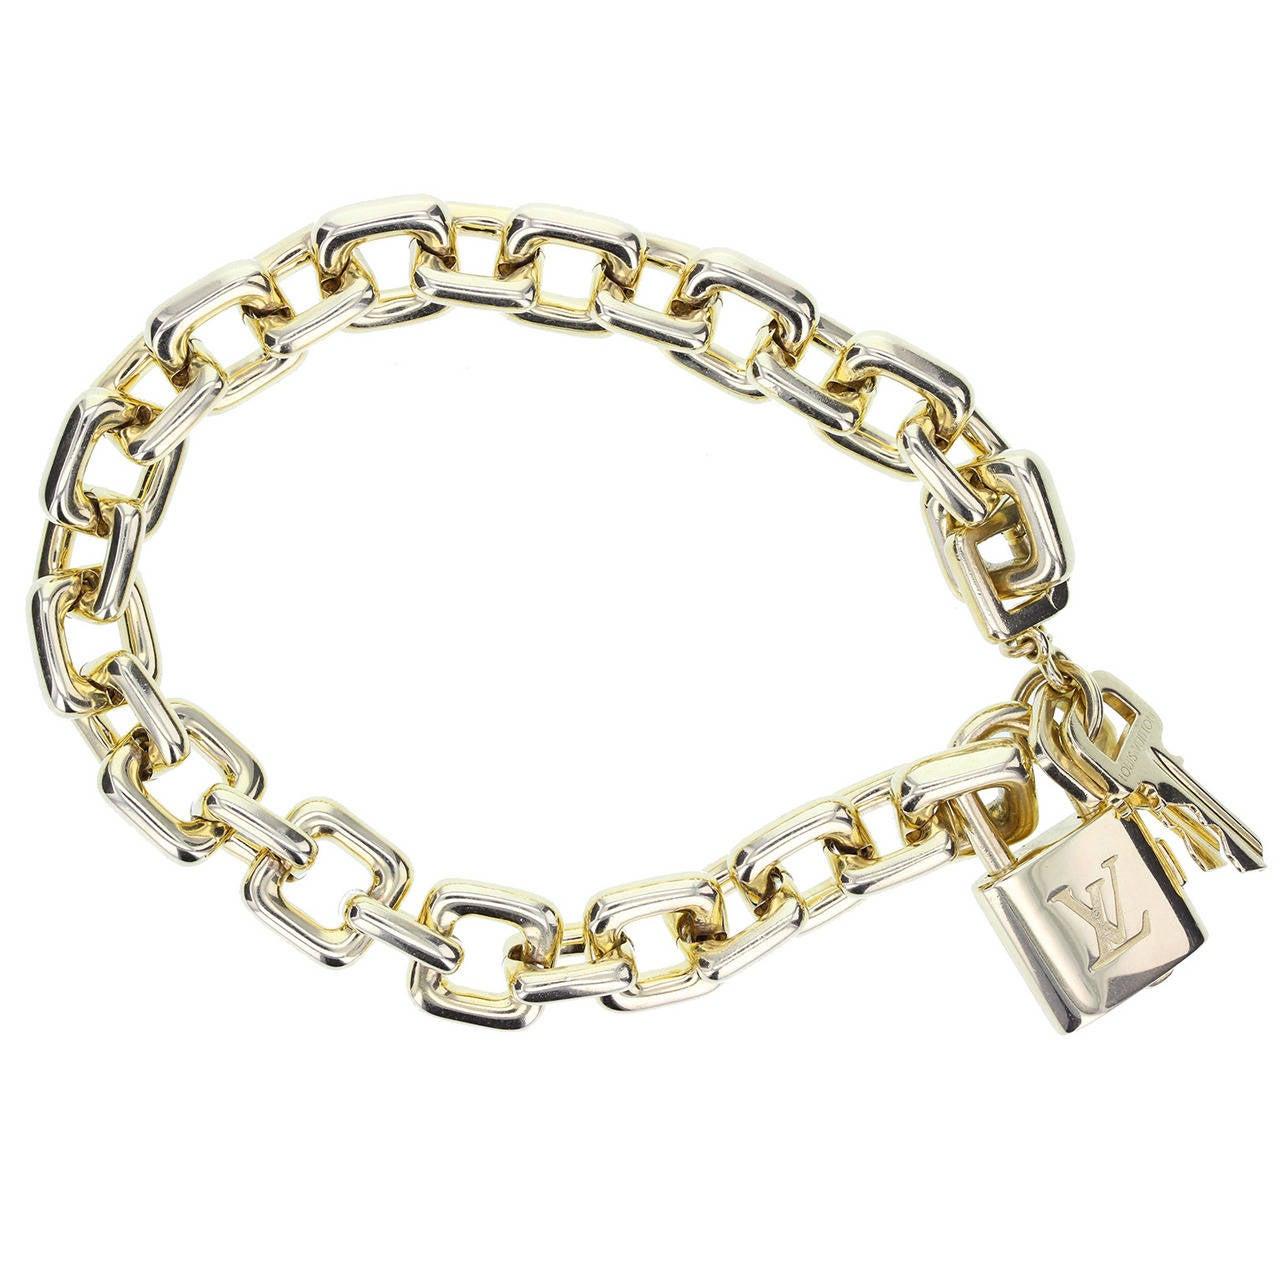 louis vuitton heavy gold padlock and key bracelet at